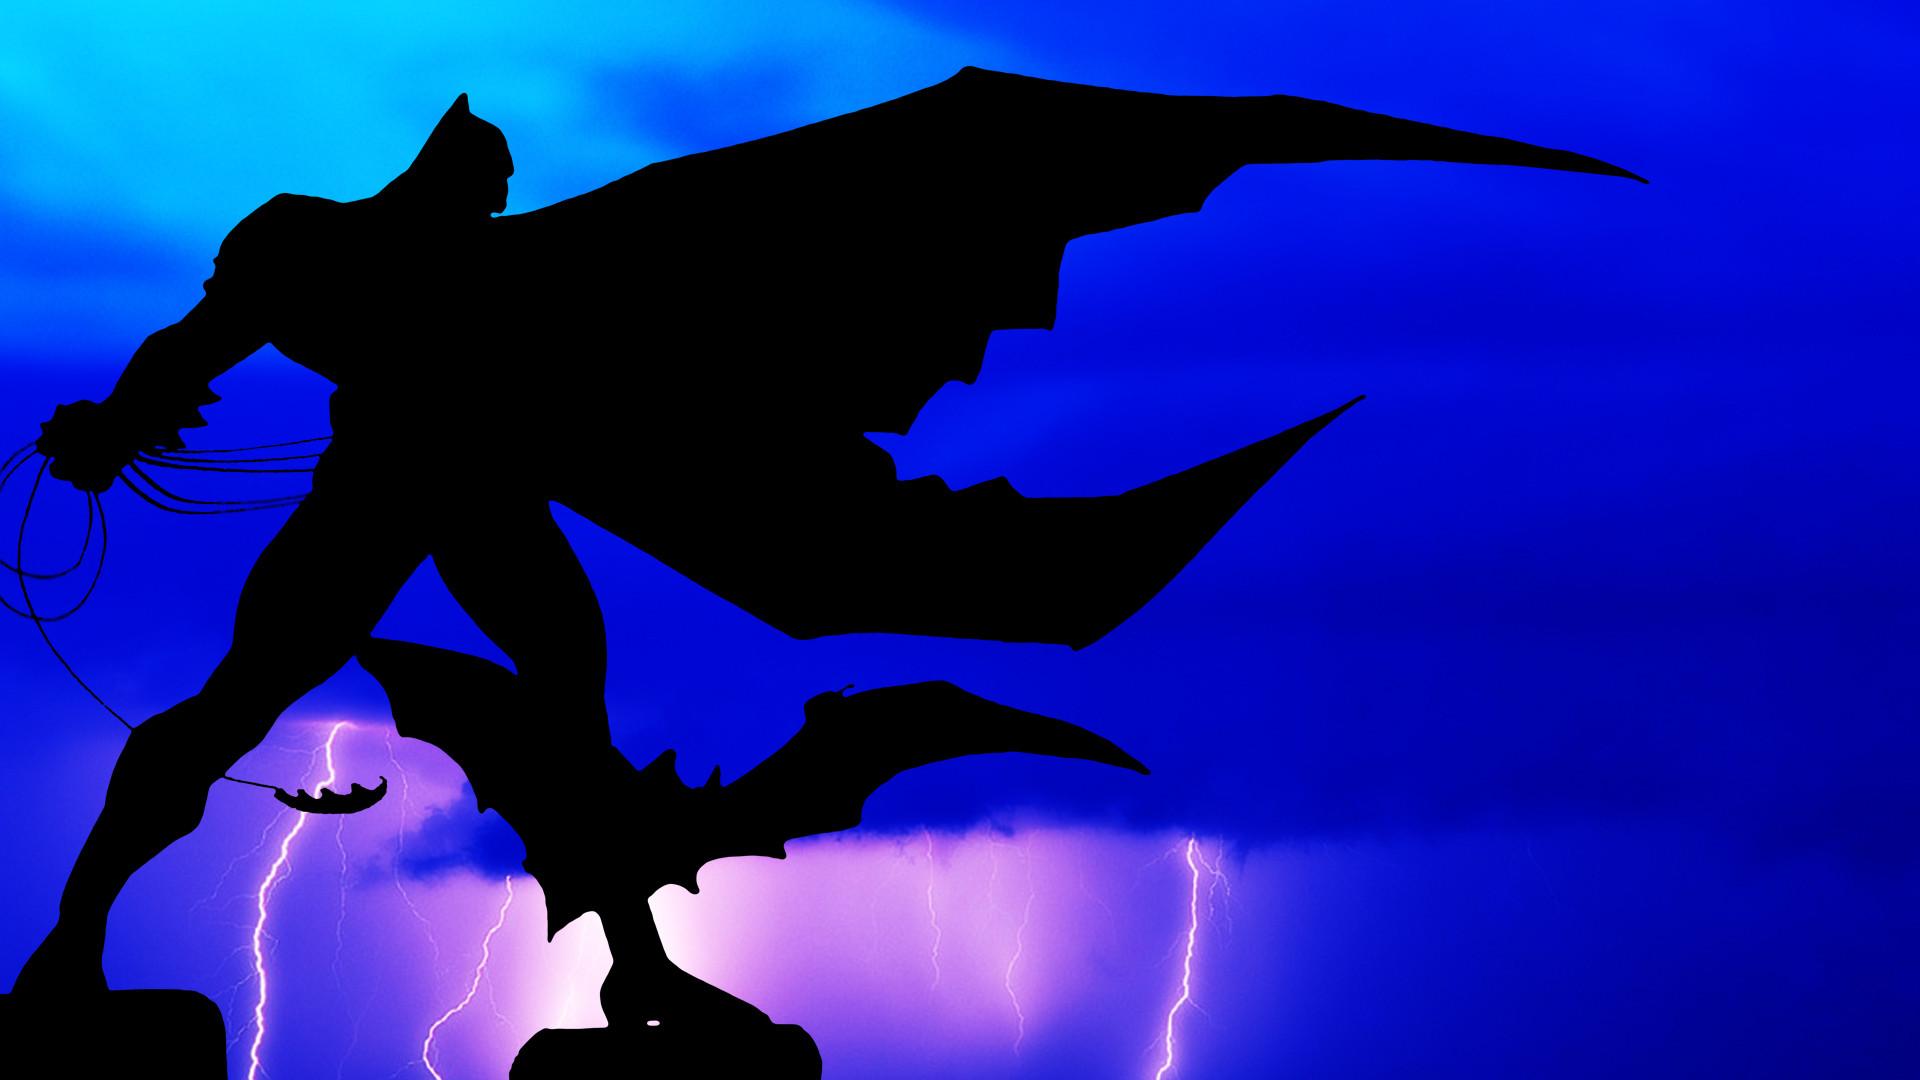 The Dark Knight Returns Wallpaper 2 by RollingTombstone on DeviantArt